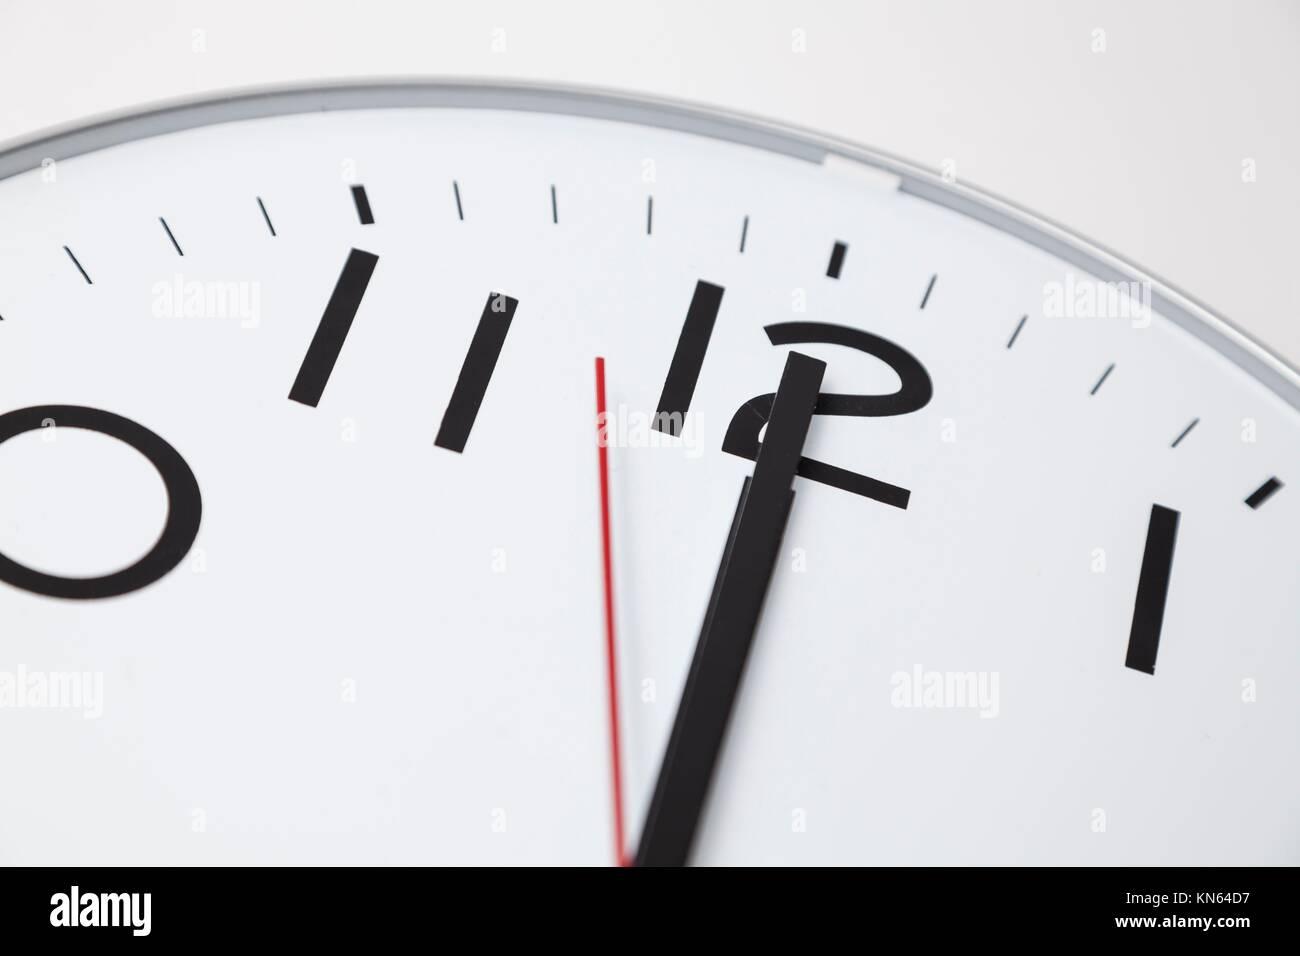 Twelve o'clock. - Stock Image